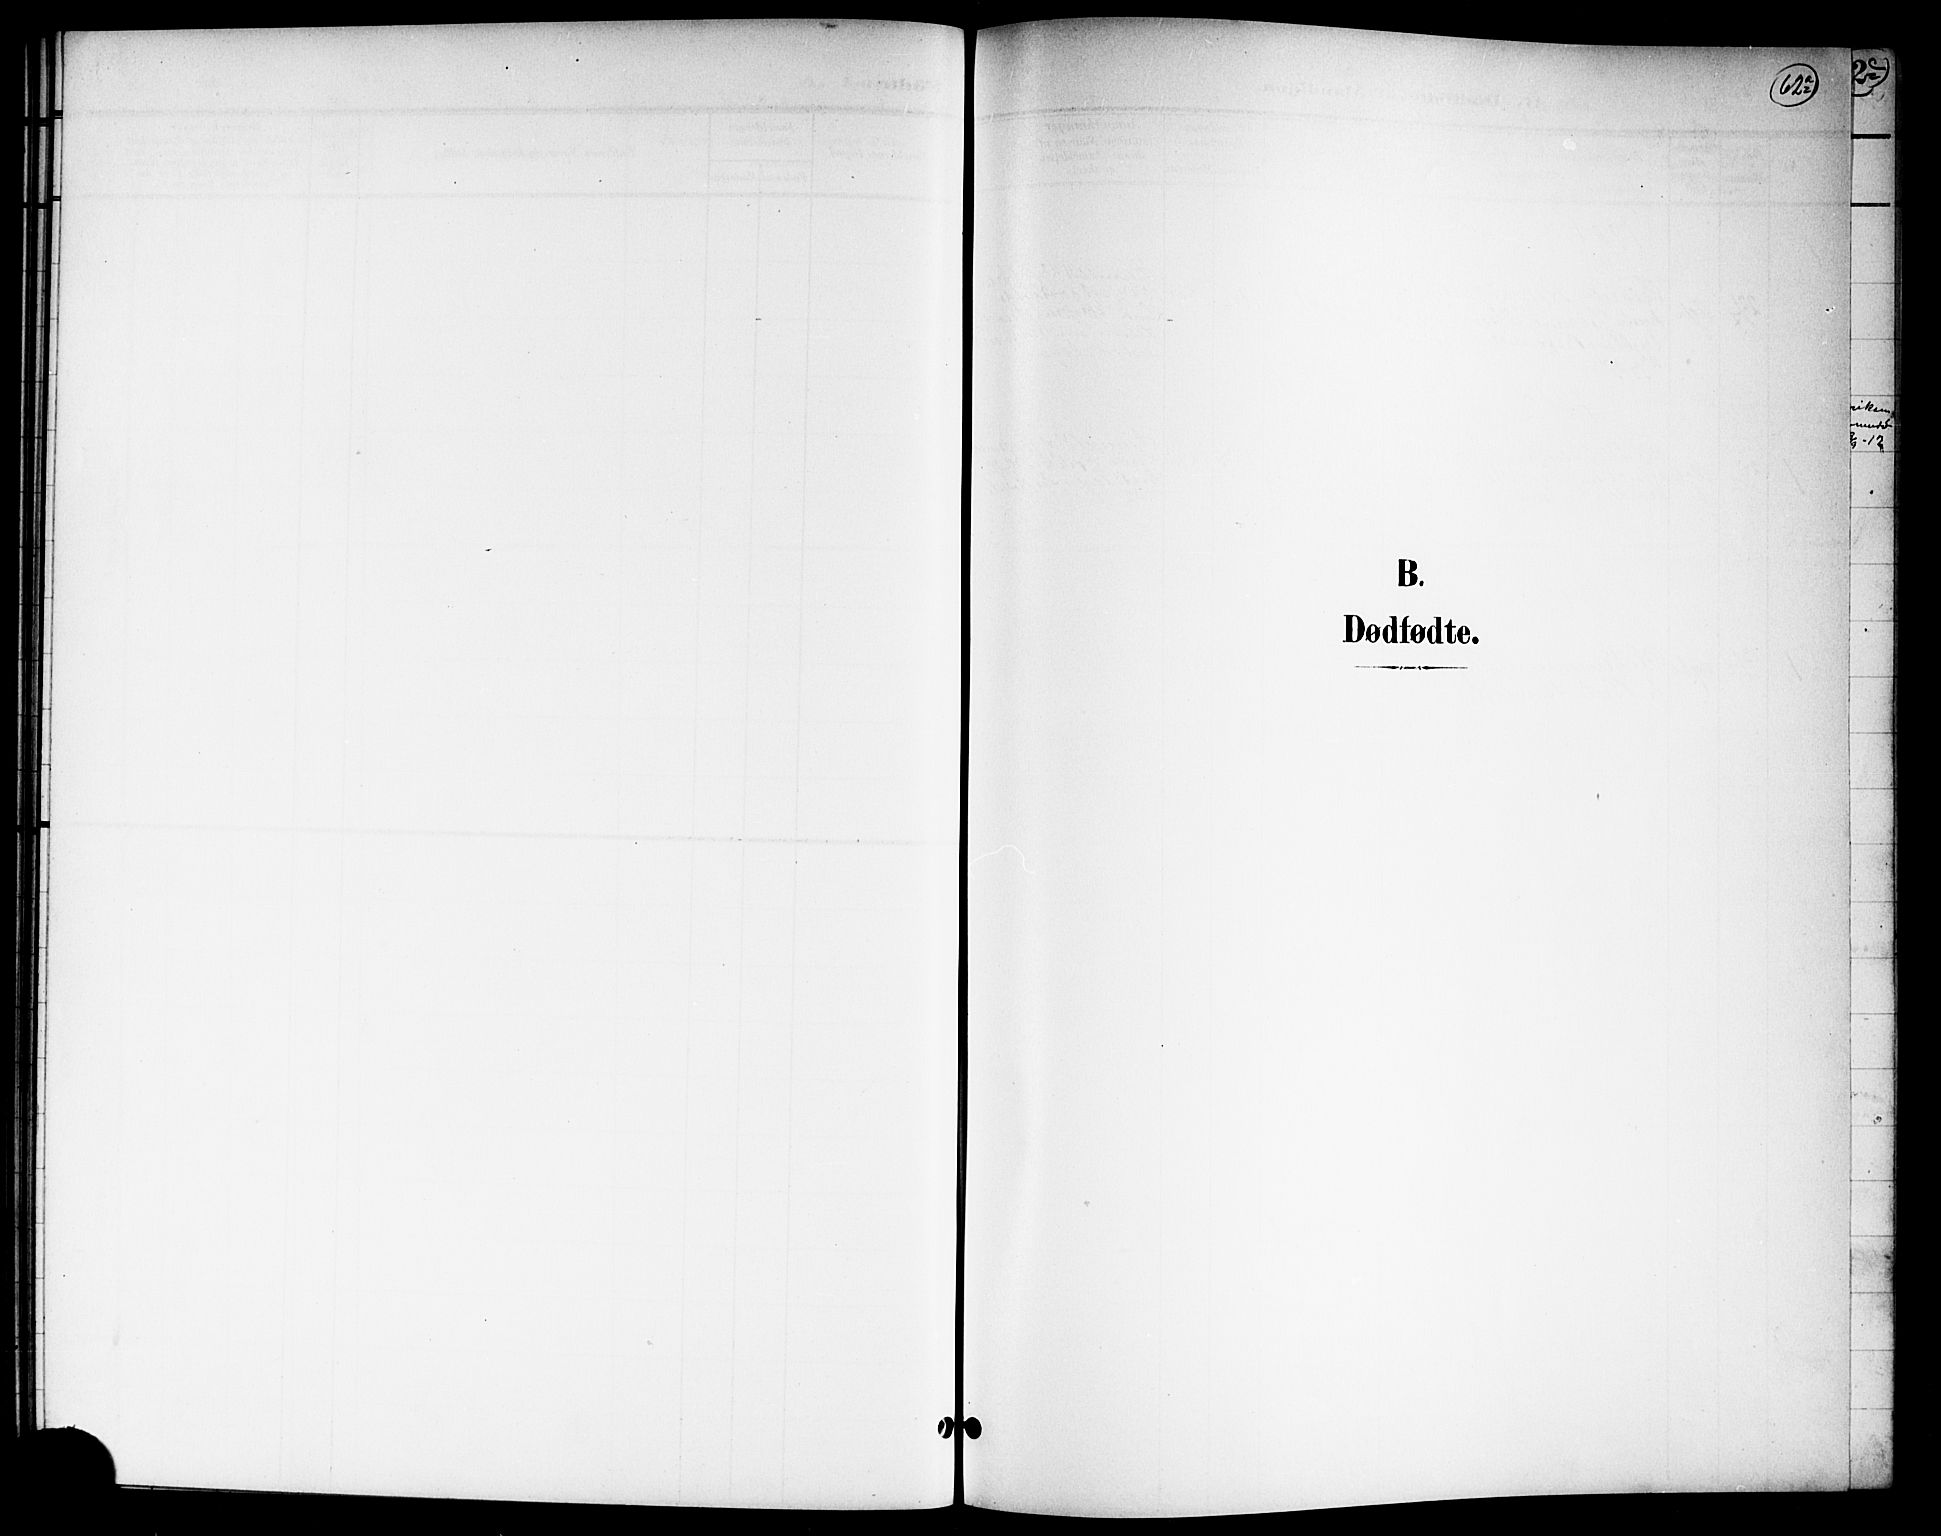 SAO, Nannestad prestekontor Kirkebøker, G/Ga/L0002: Klokkerbok nr. I 2, 1901-1913, s. 62a